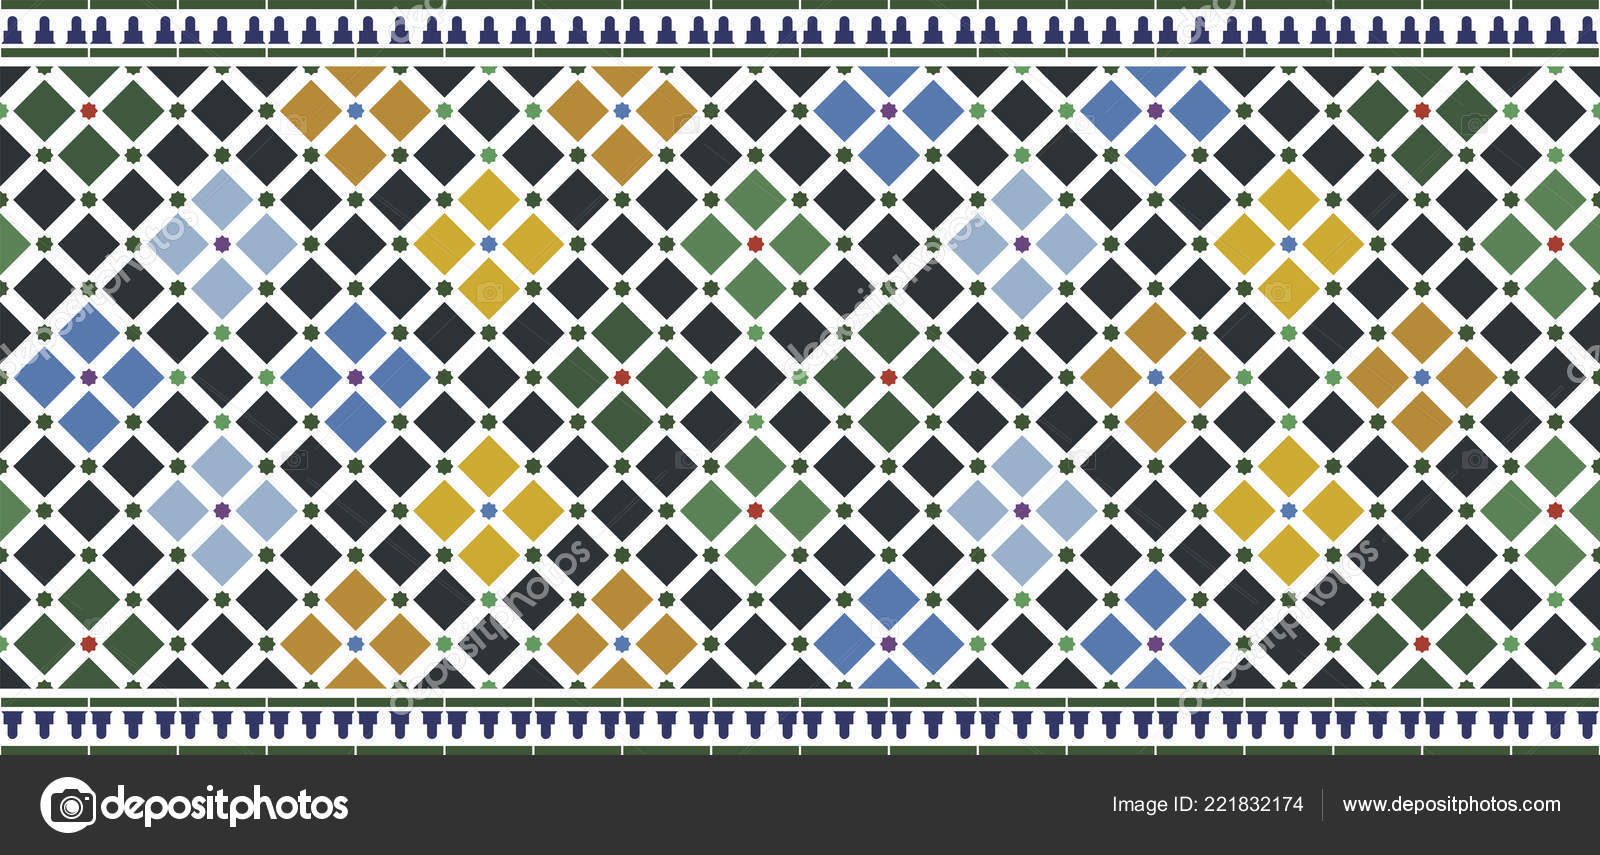 Carreaux Dessin Alhambra Photographie Oculo 221832174